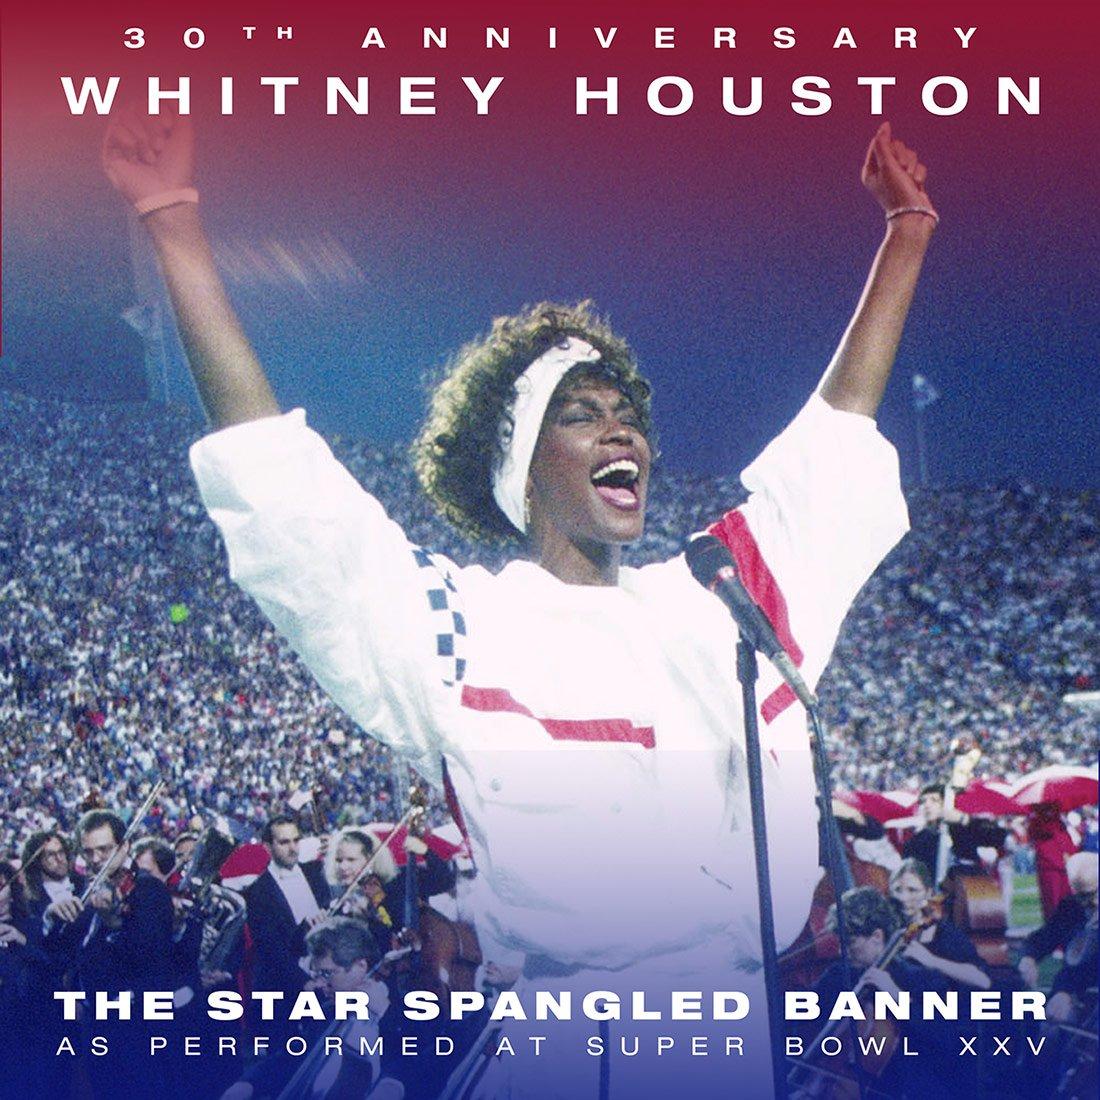 Whitney Houston The Star Spangled Banner 30th Anniversary